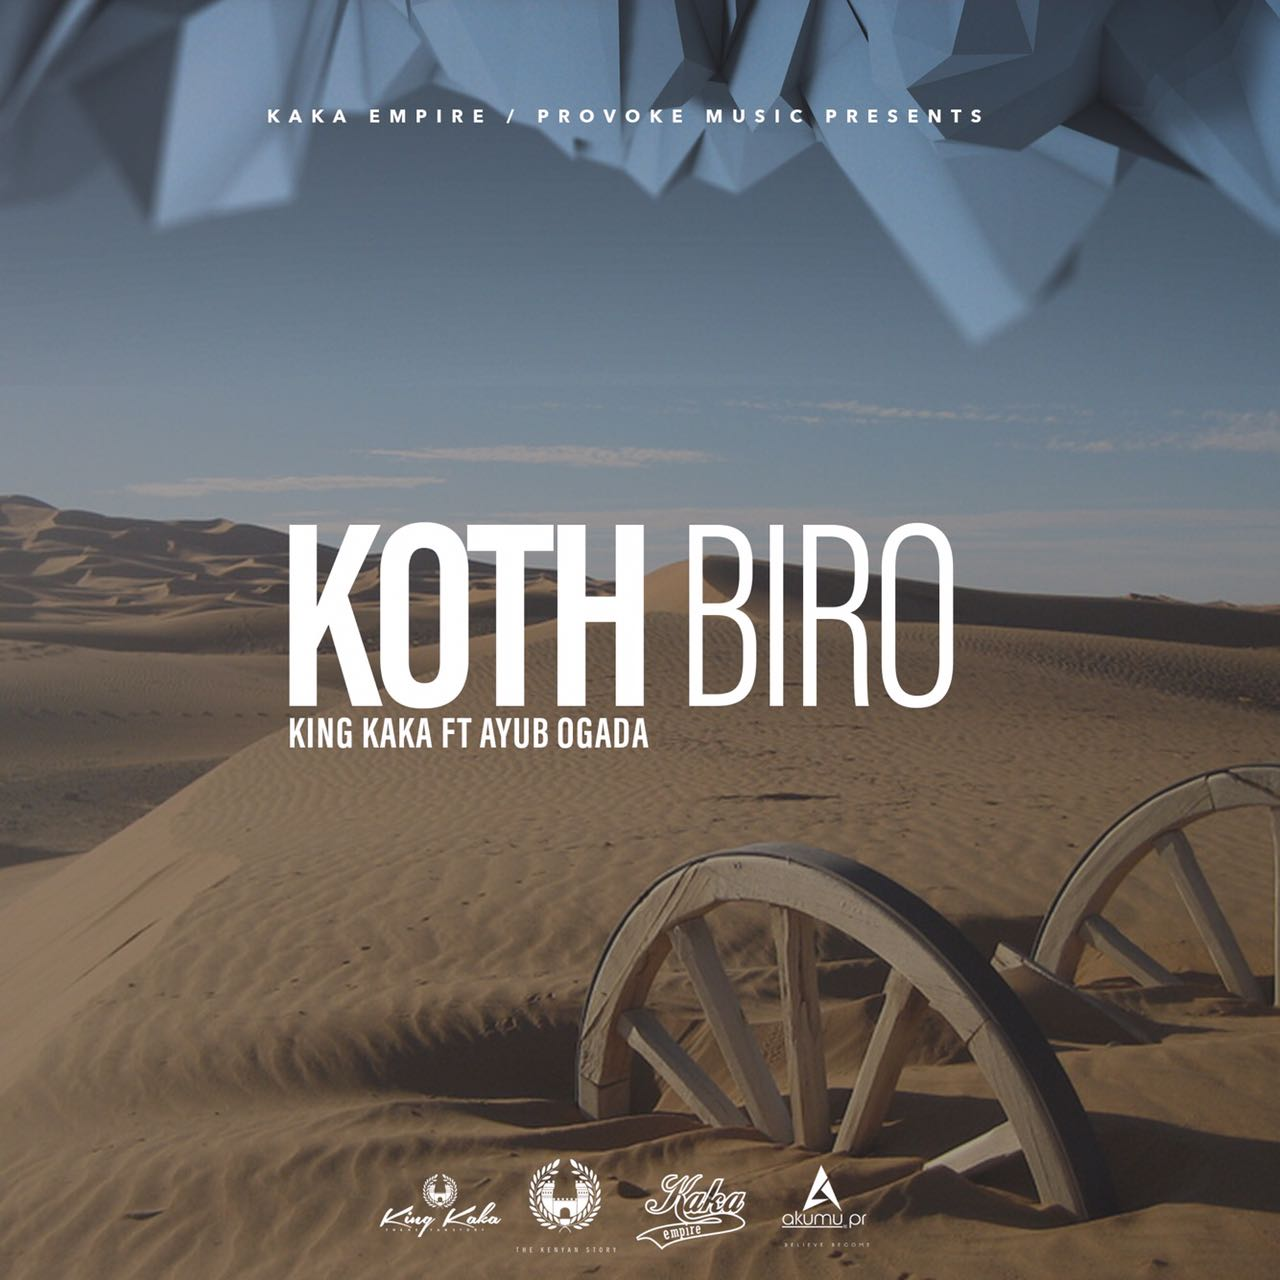 KOTH BIRO King Kaka